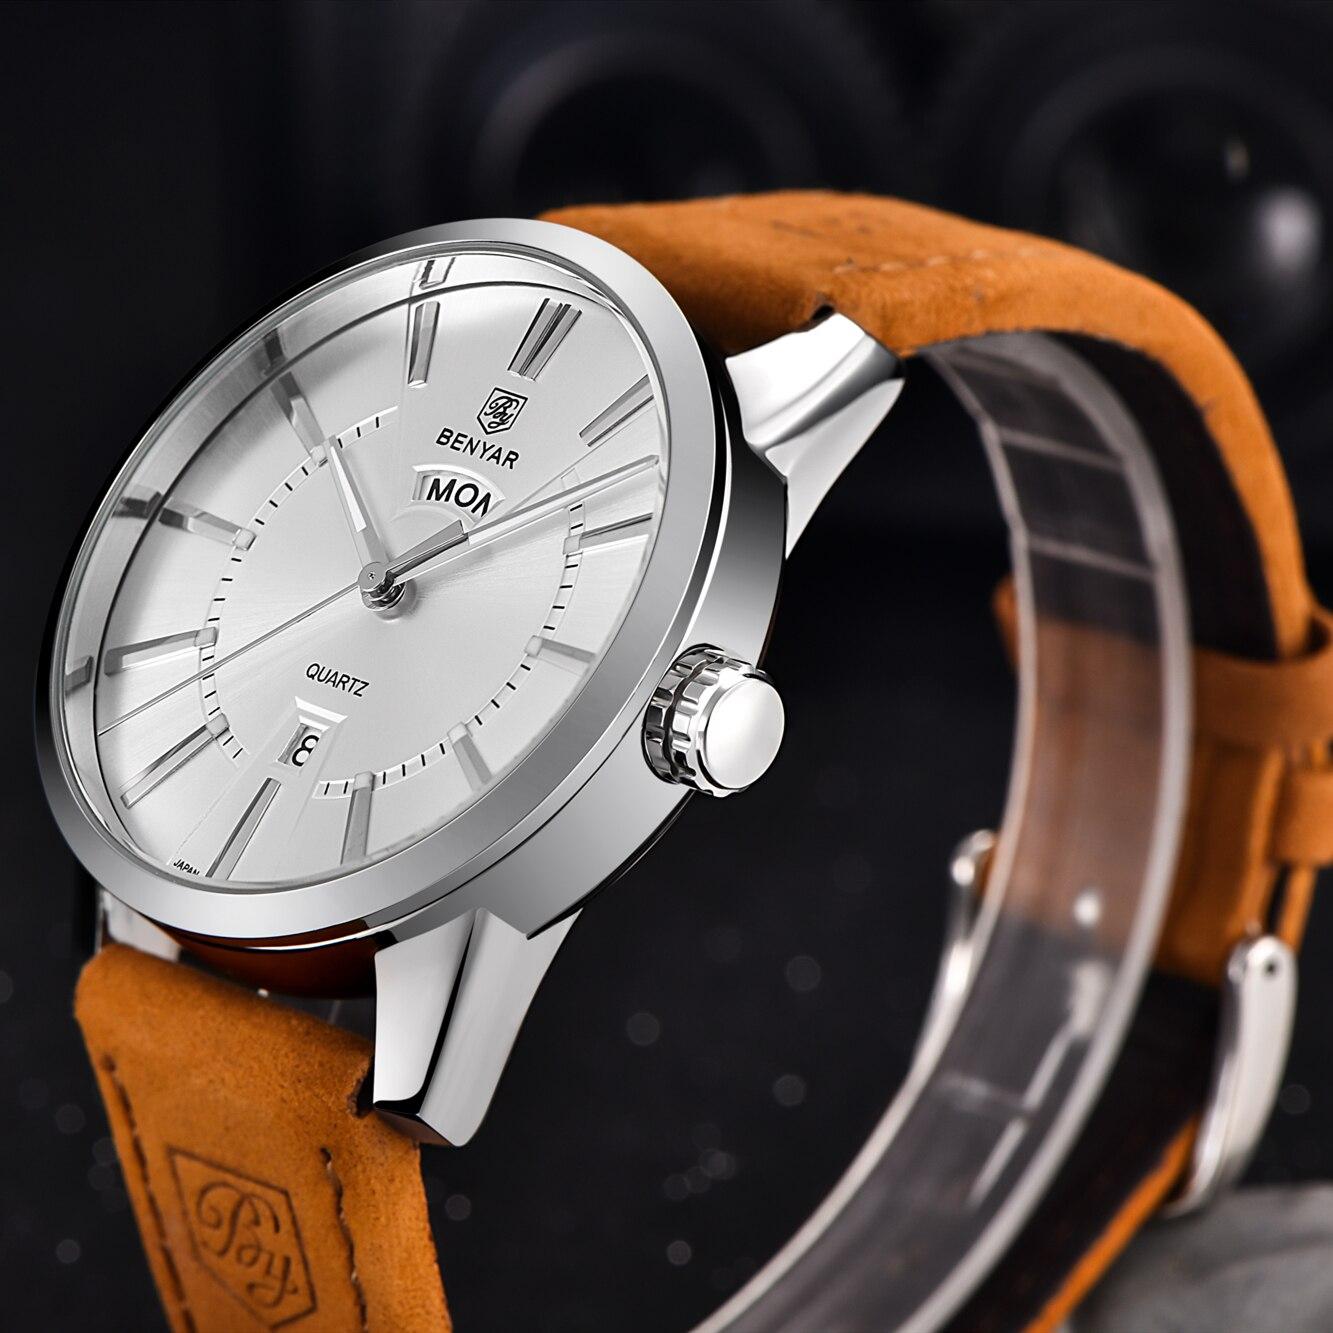 Image 2 - Relogio Masculino BENYAR Luxury Brand  Analog Display Date Mens Quartz Watch 30M Waterproof Genuine Leather Strap Casual Watchclock ipodwatch reportclock rugby -